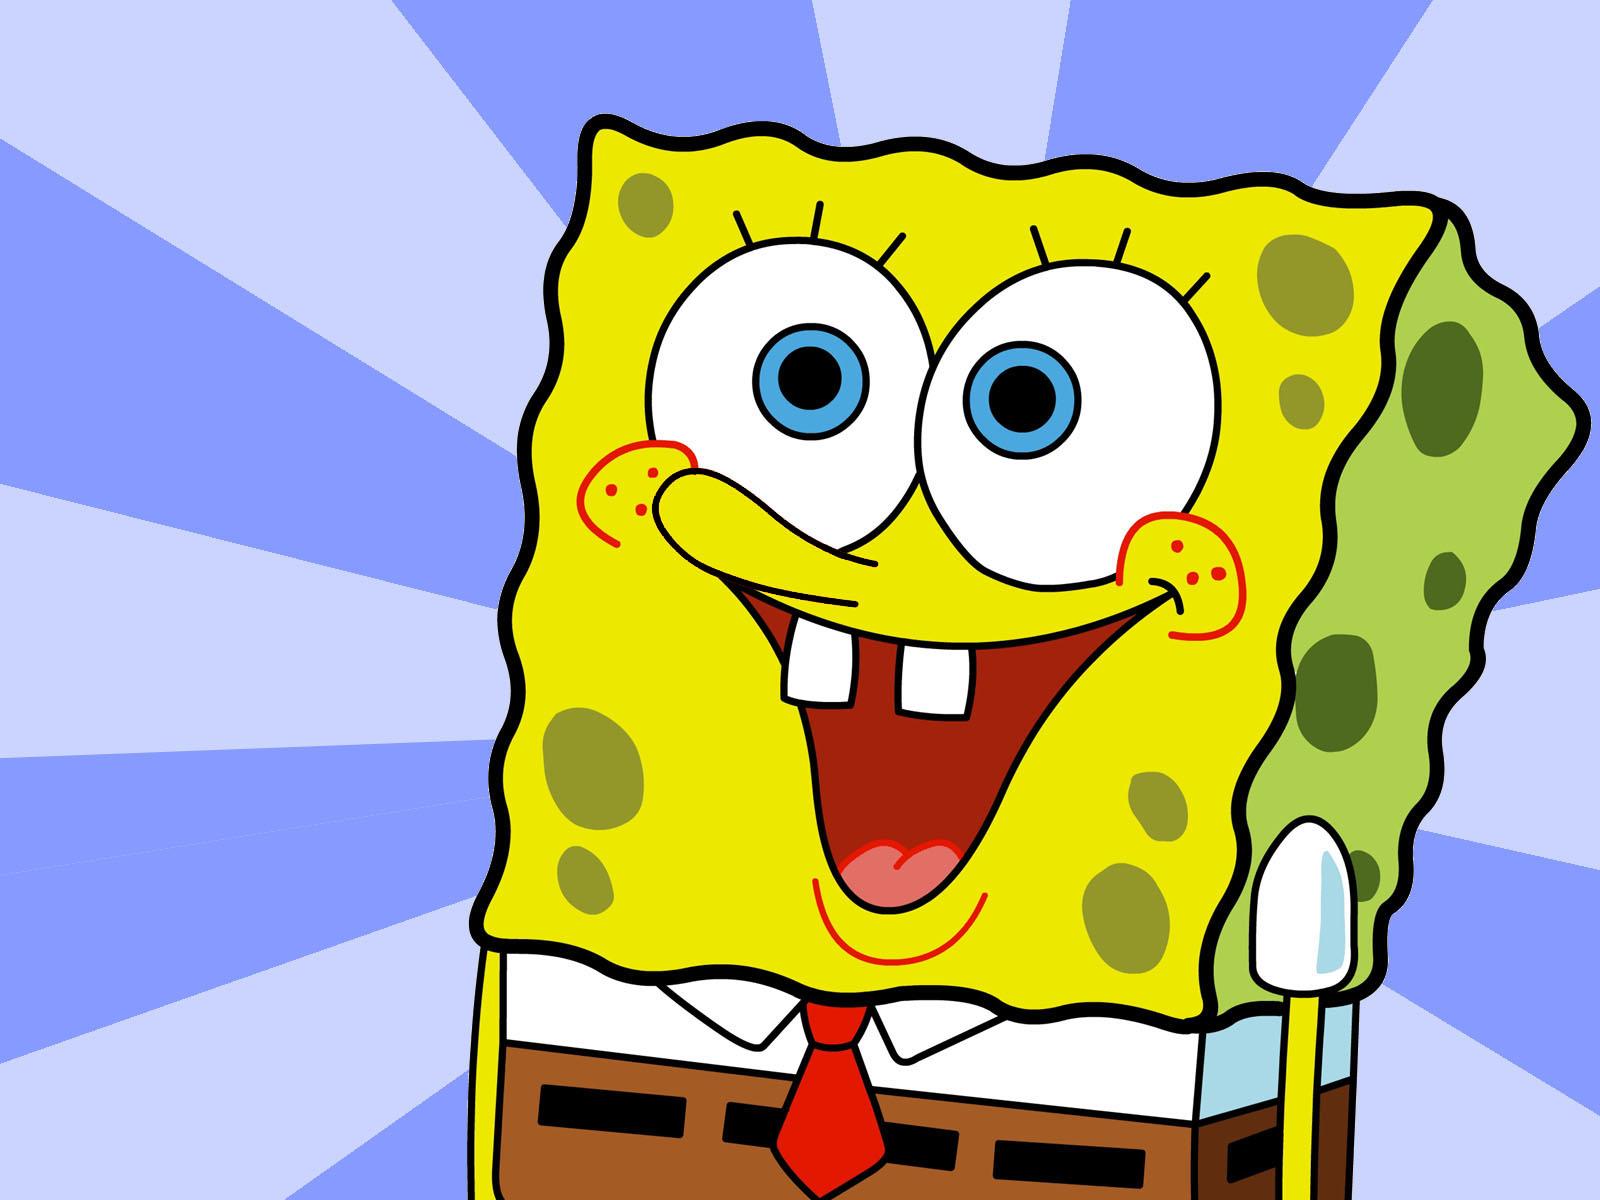 Malvorlagen spongebob kostenlos